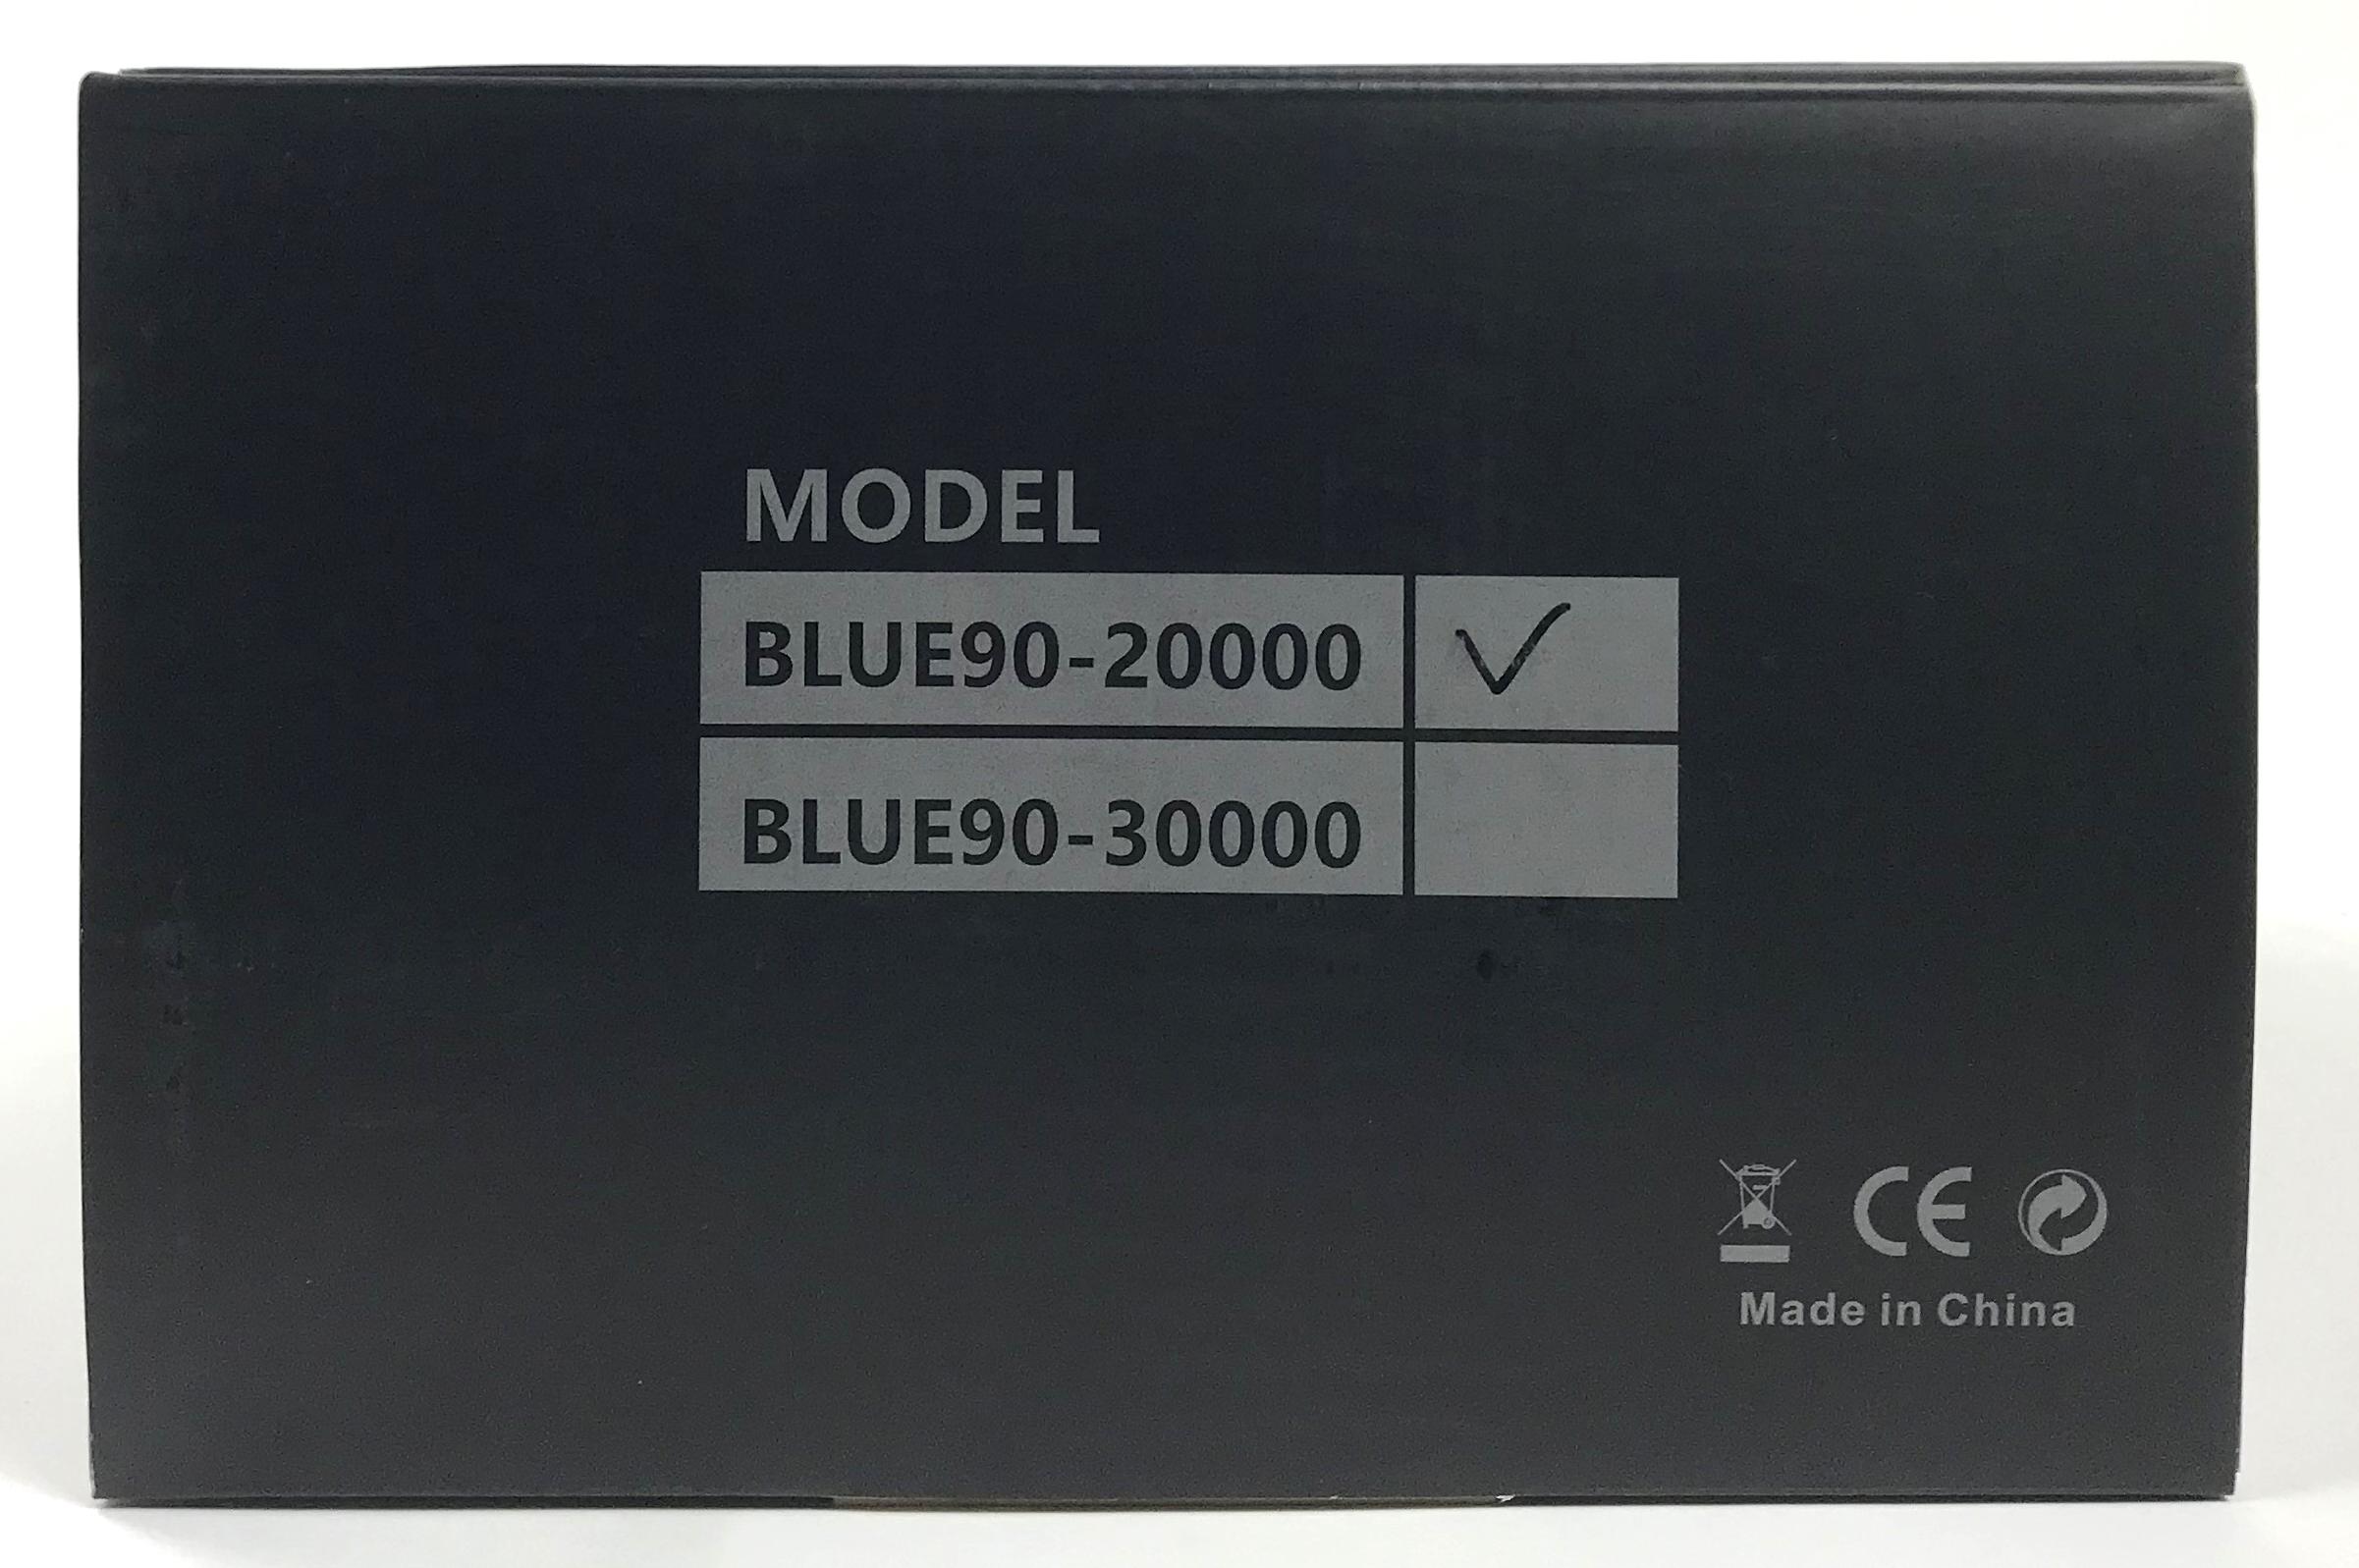 Platinum DC Blue 20000 Pump - 5263 gph